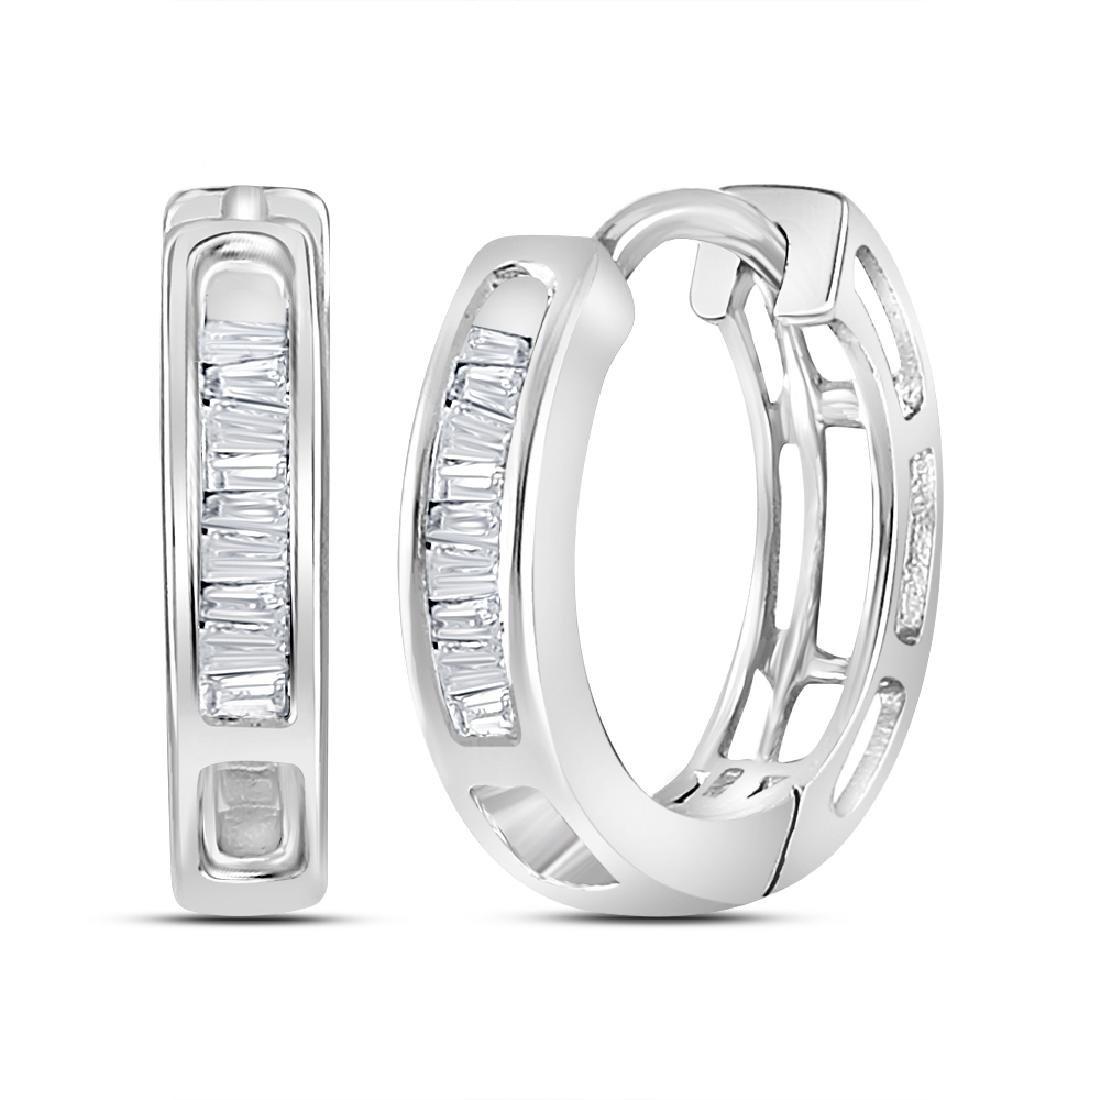 0.15 CTW Diamond Huggie Hoop Earrings 10KT White Gold -